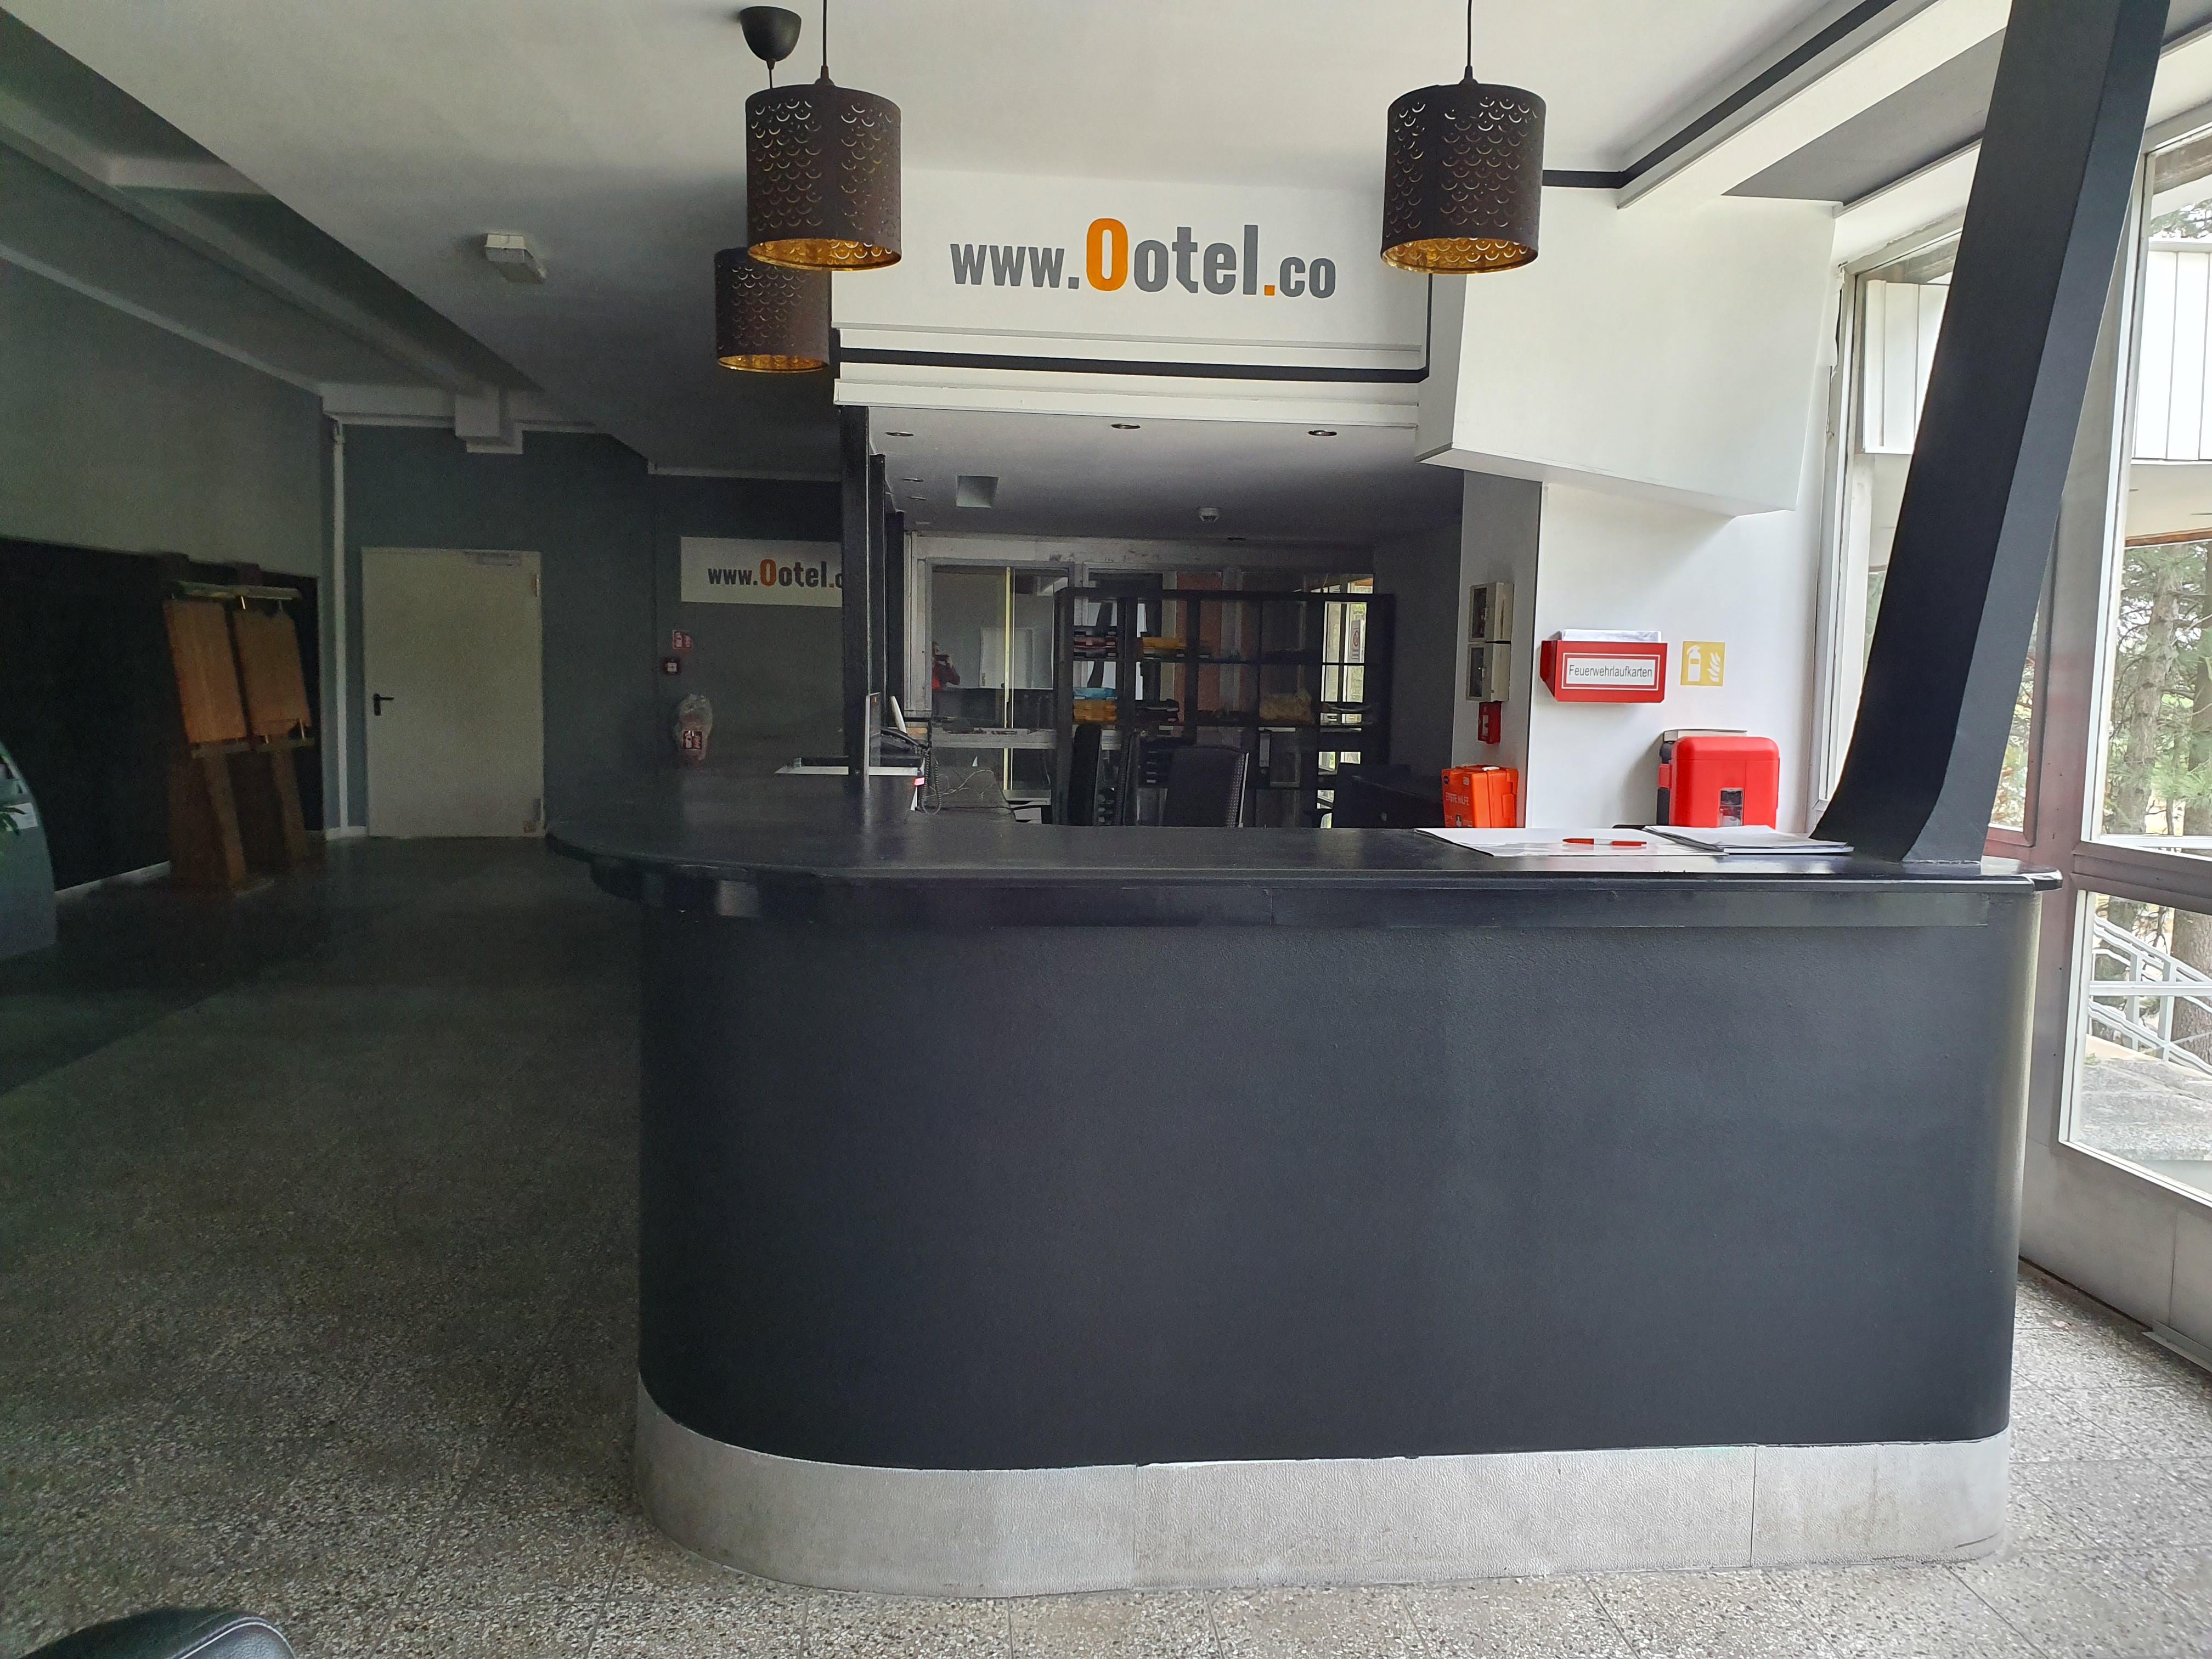 Cheap accommodation in Berlin